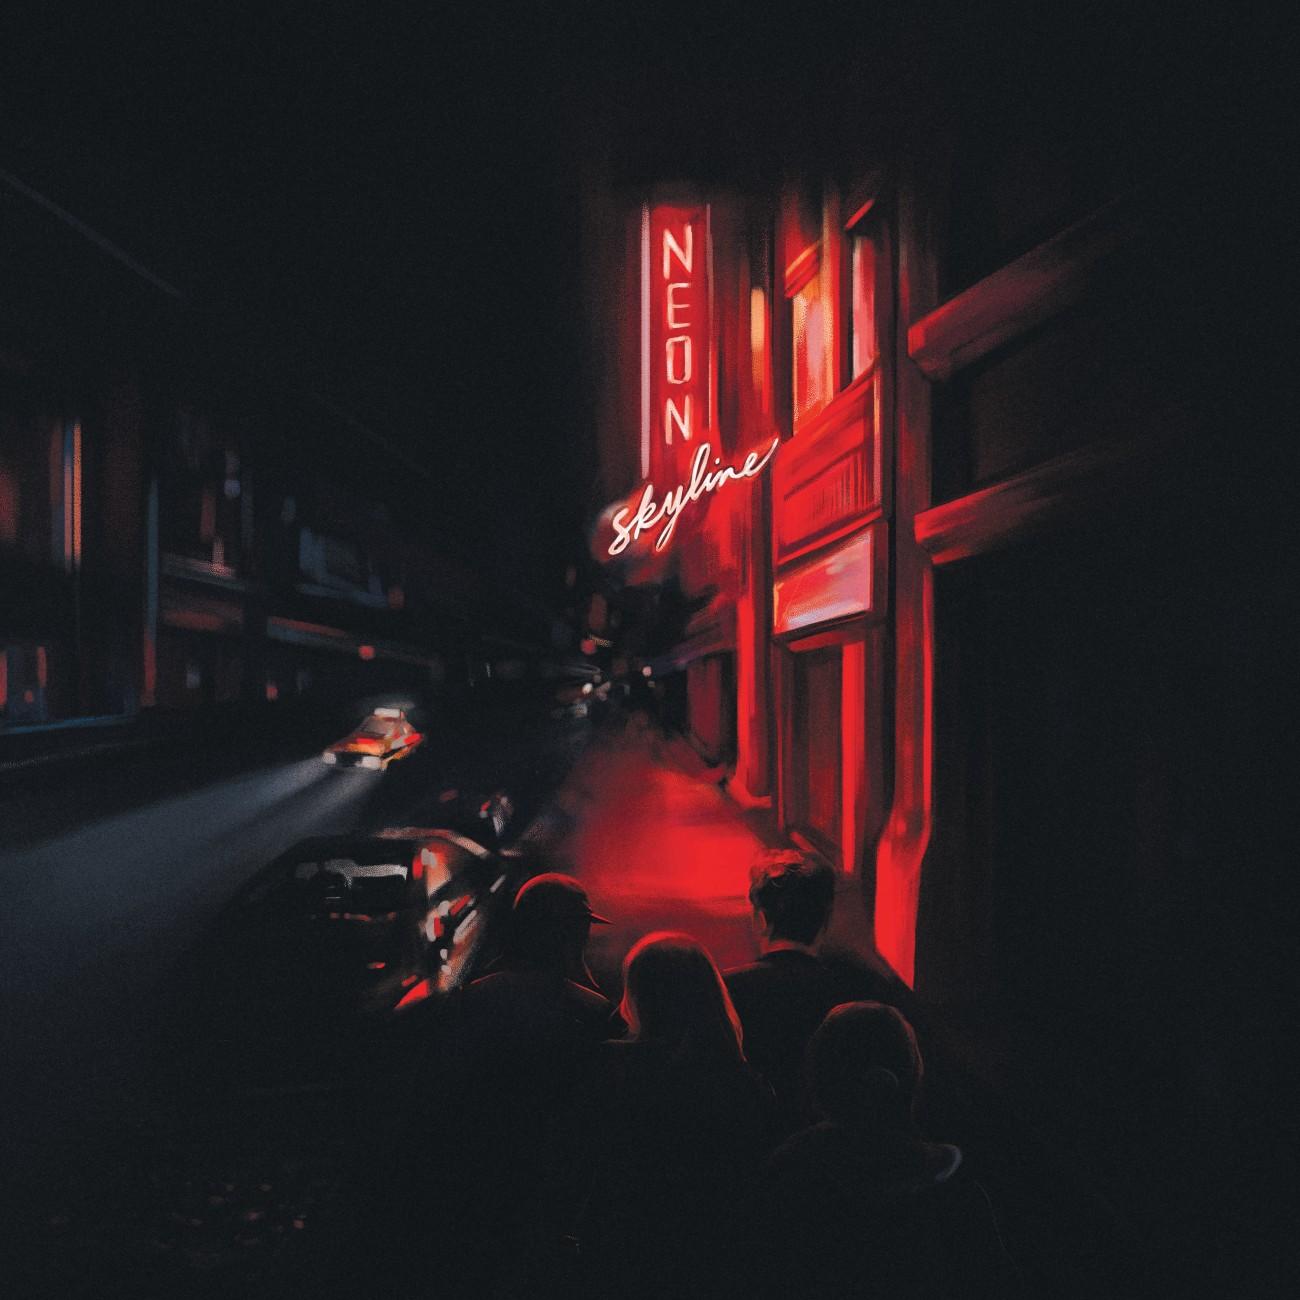 Andy-Shauf-The-Neon-Skyline-1579285965